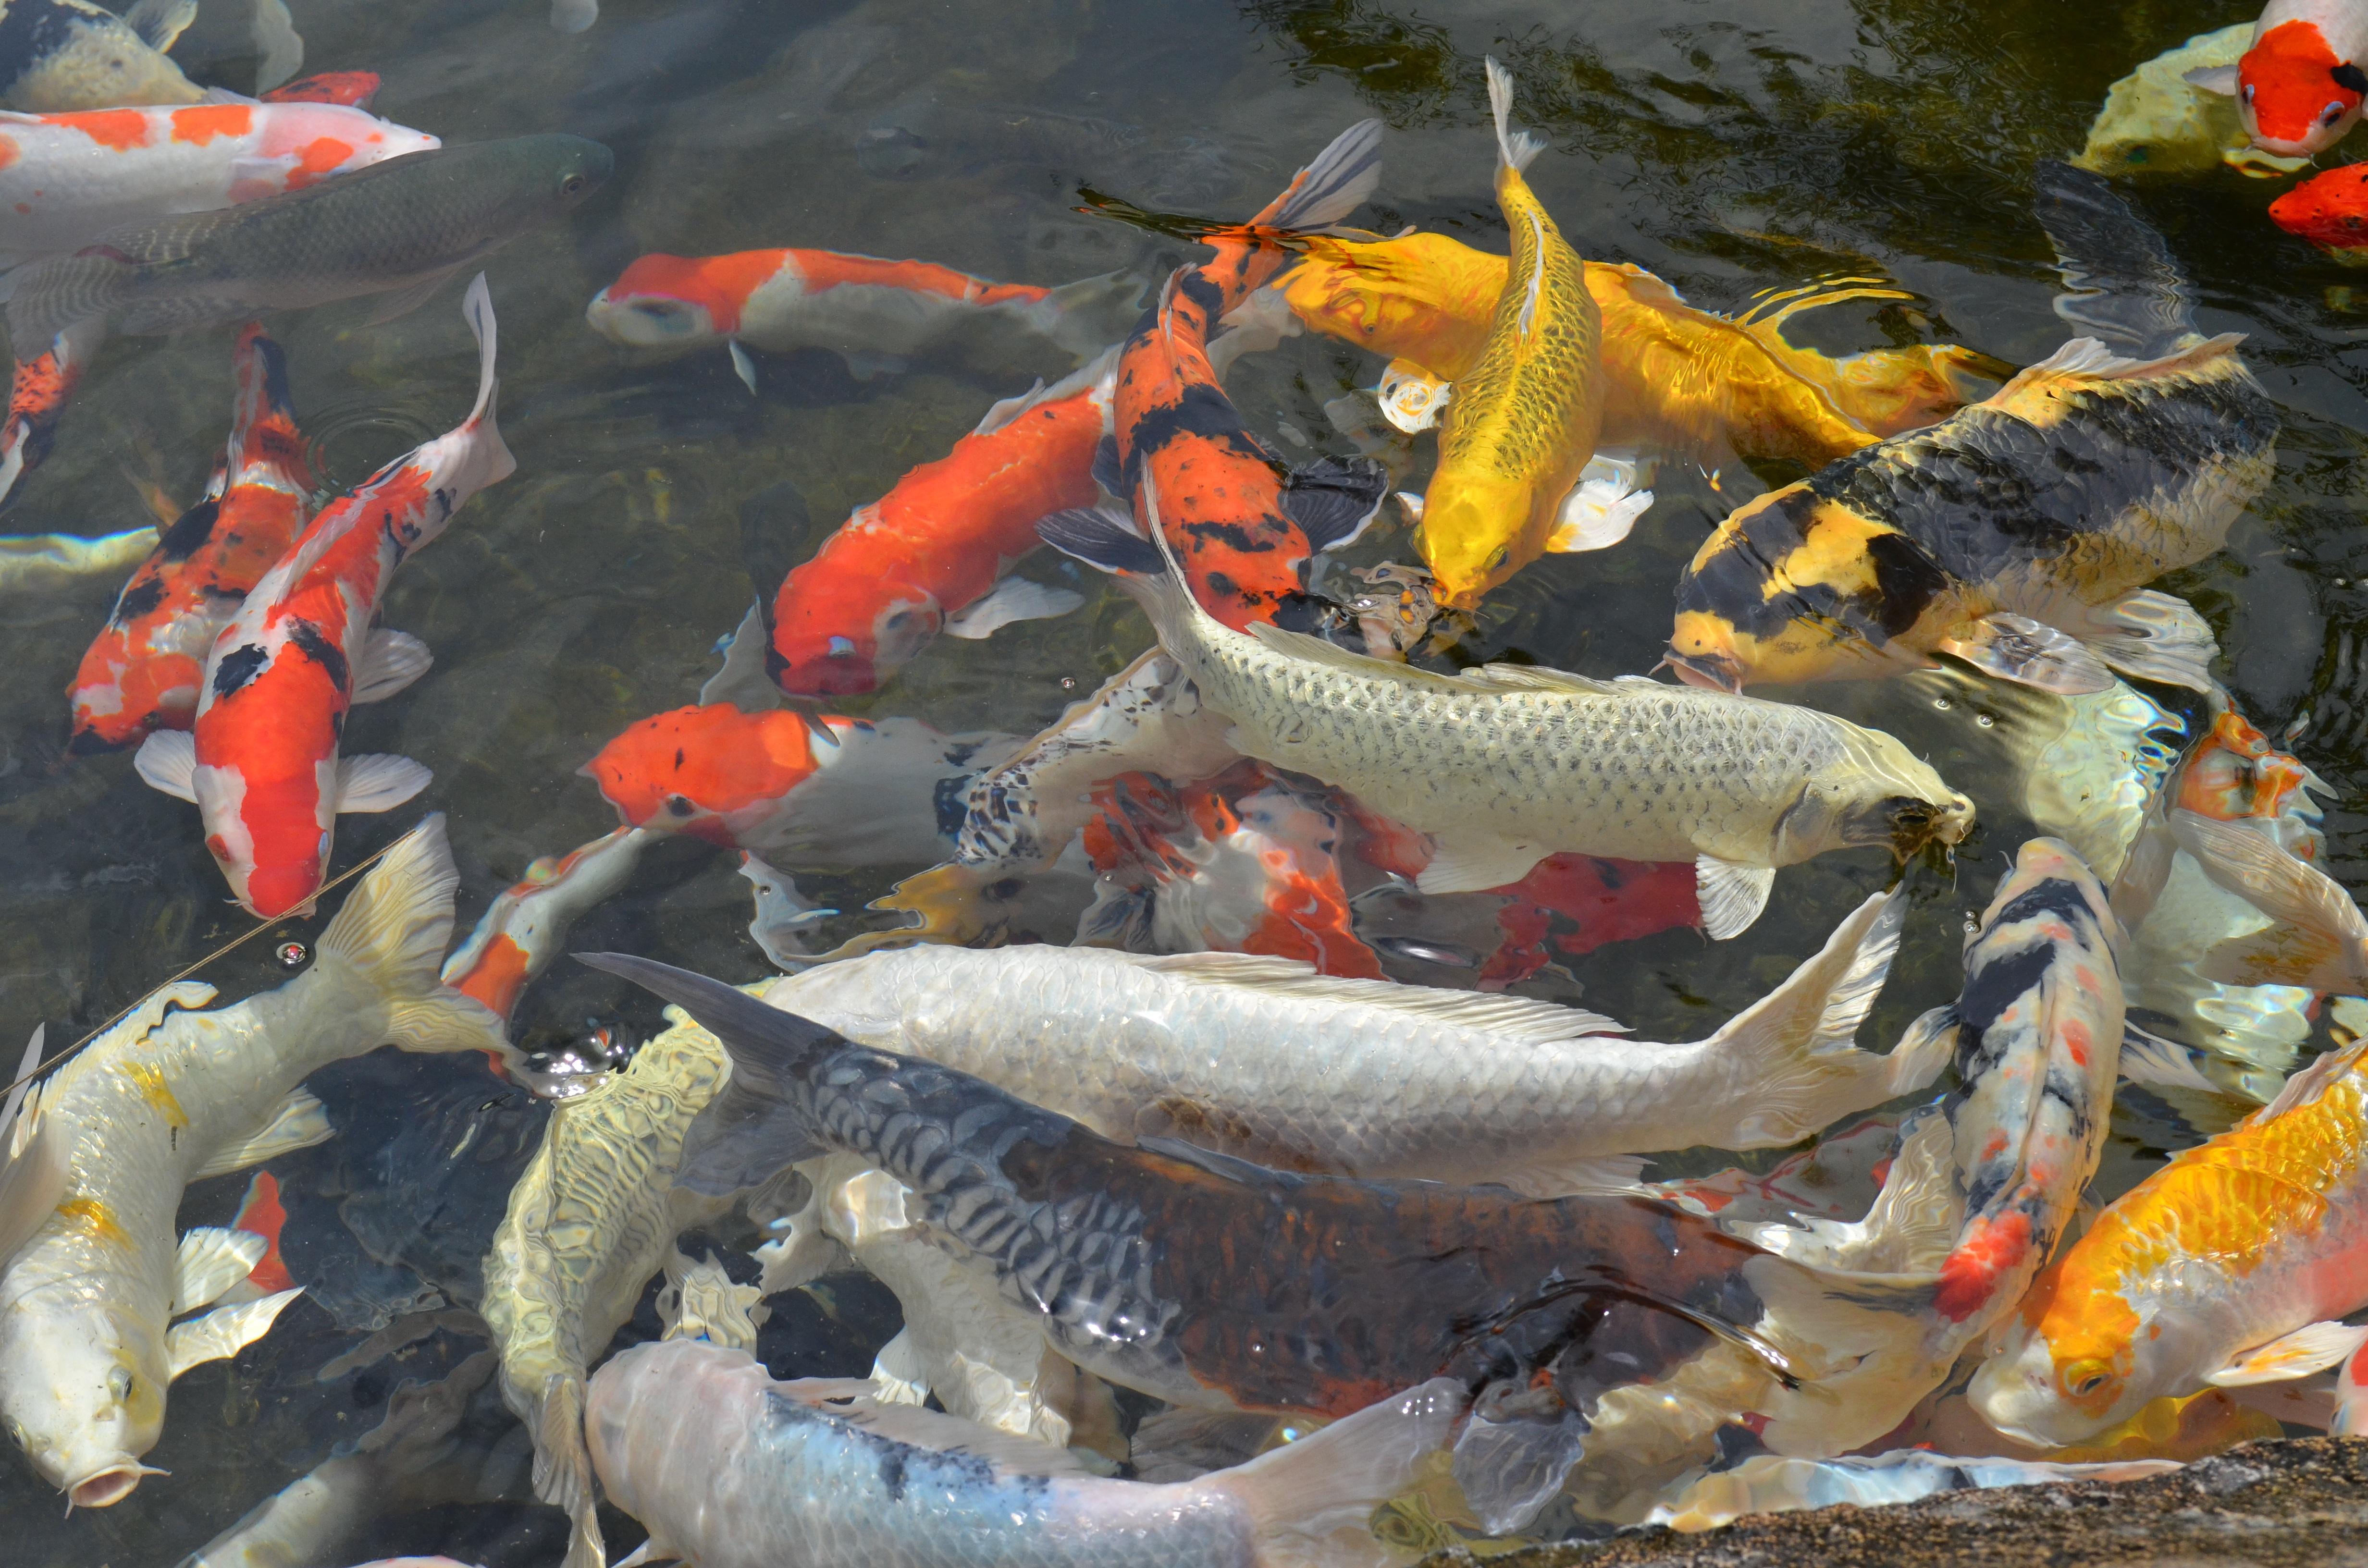 al aire libre pescado koi pez ornamental pez koi estanque de peces biologa marina